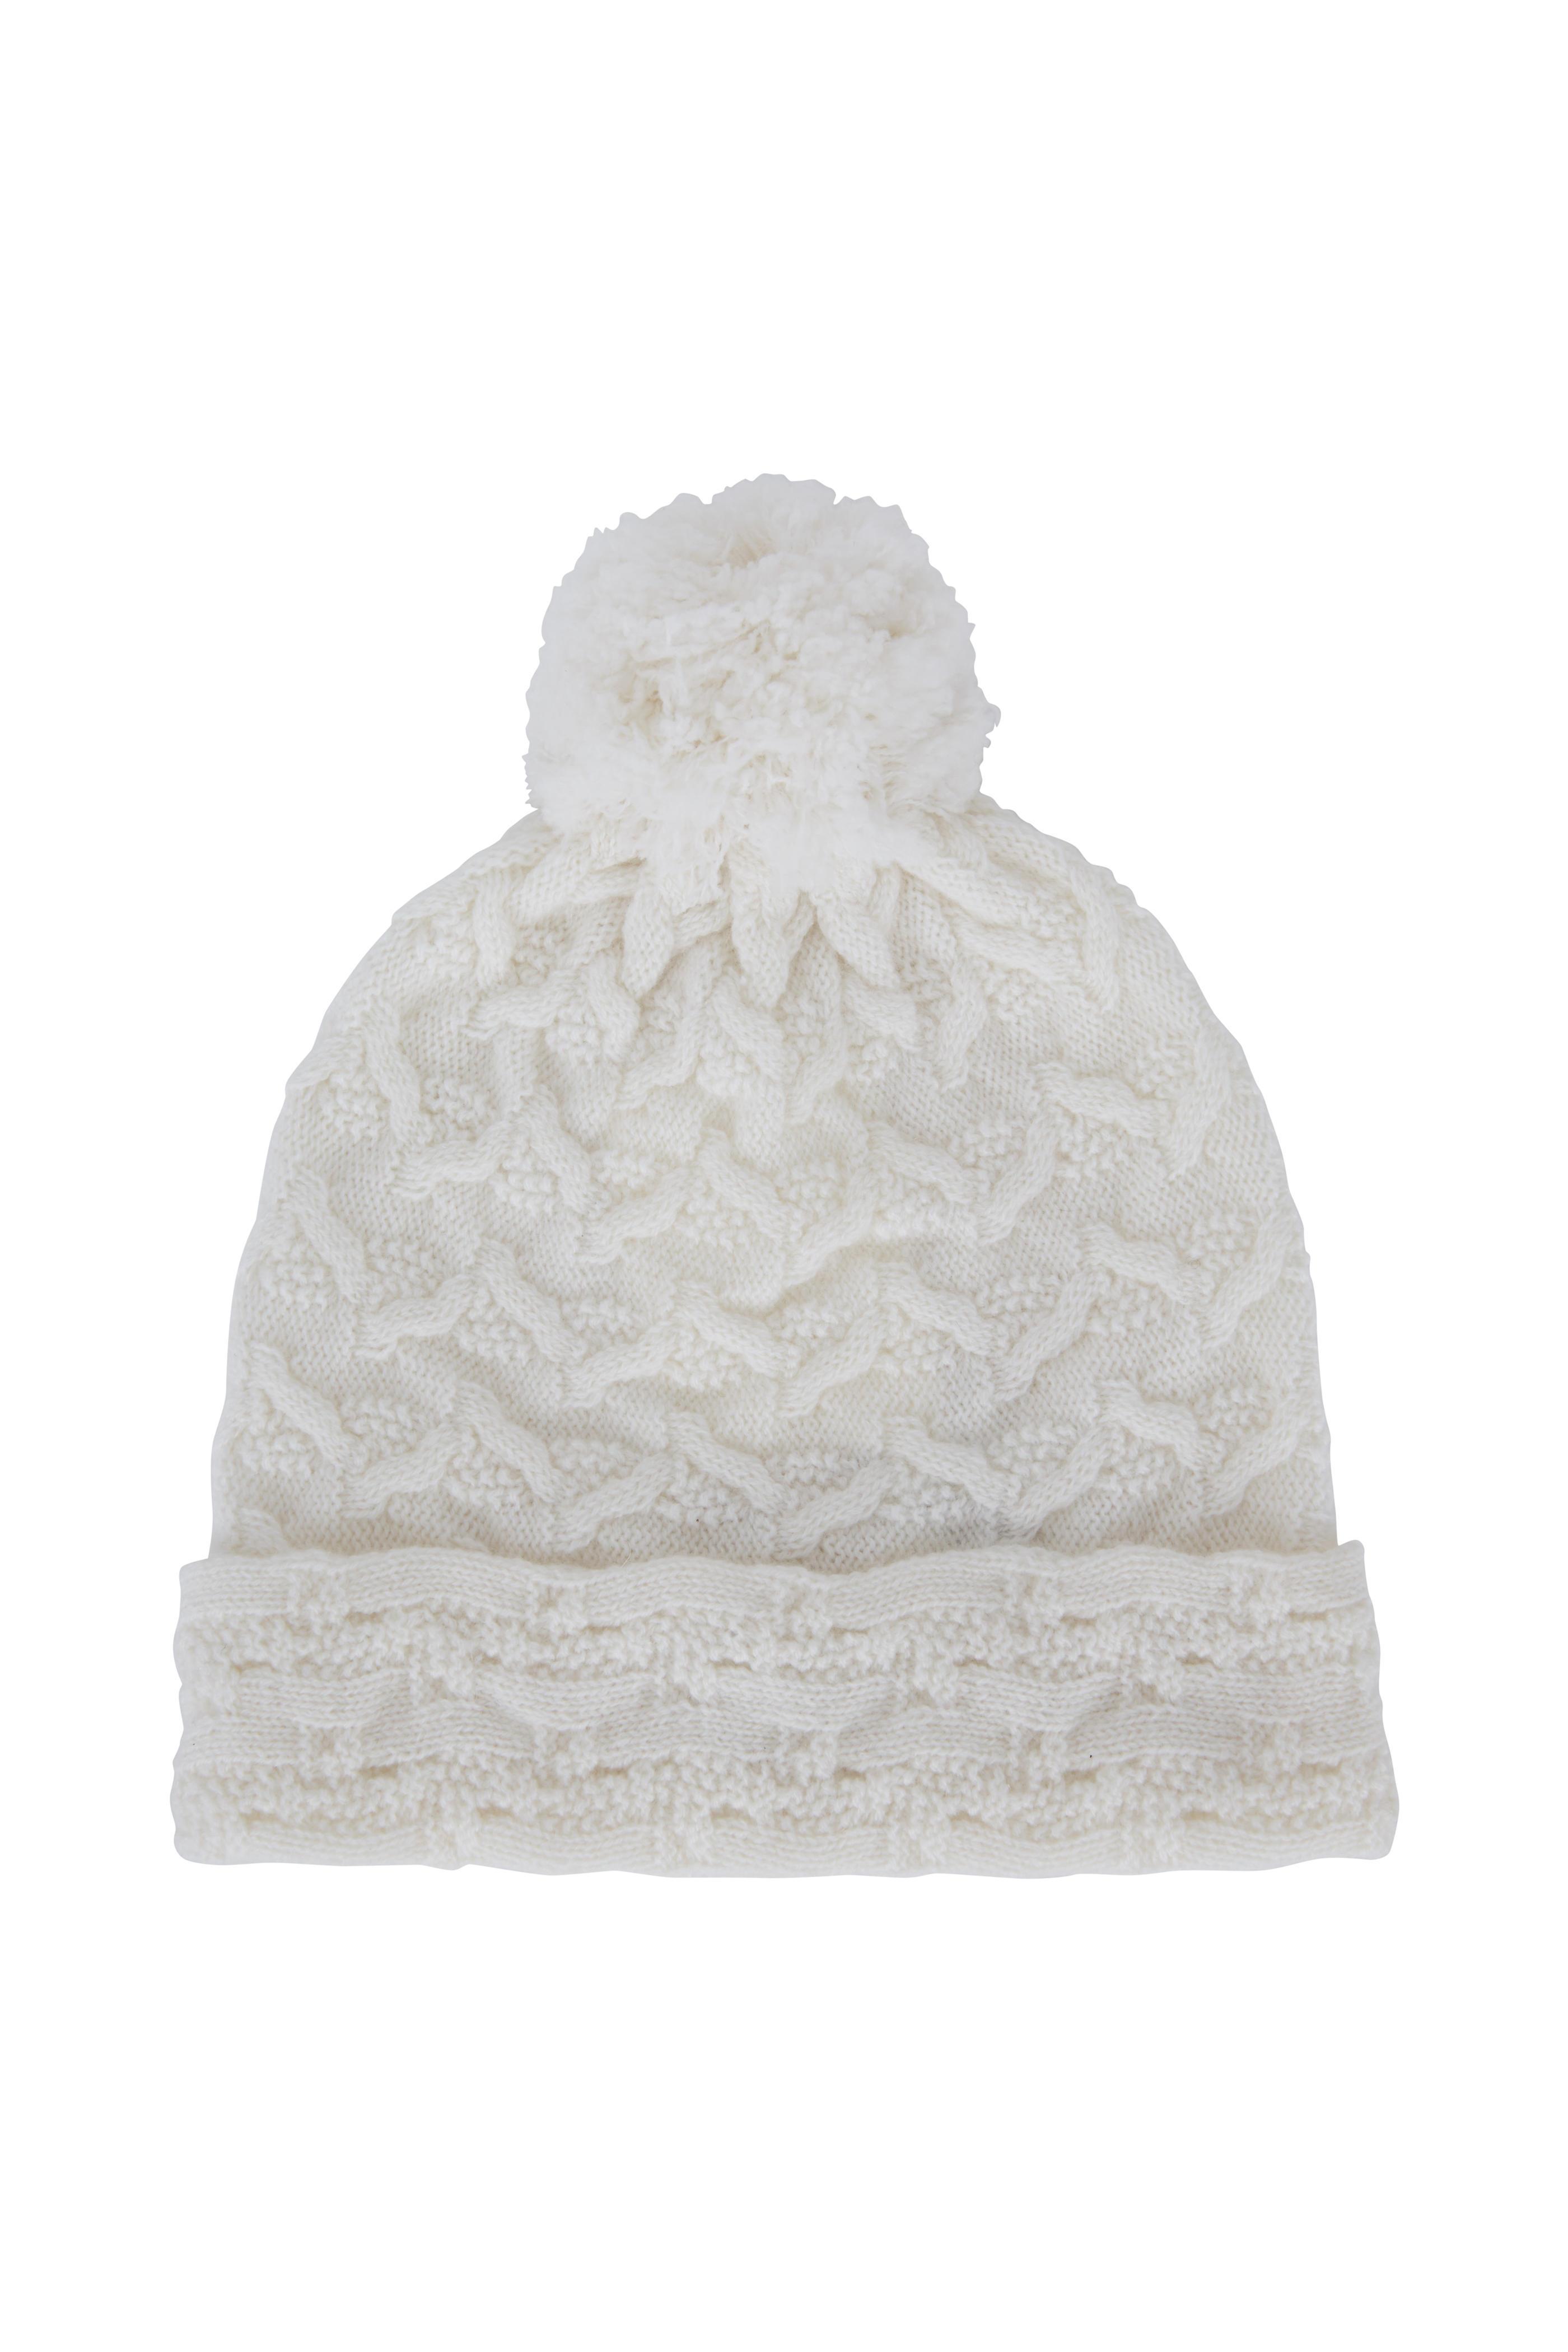 40c73af8be3 Kinross - Ivory Cashmere Cable Knot Pom Pom Hat